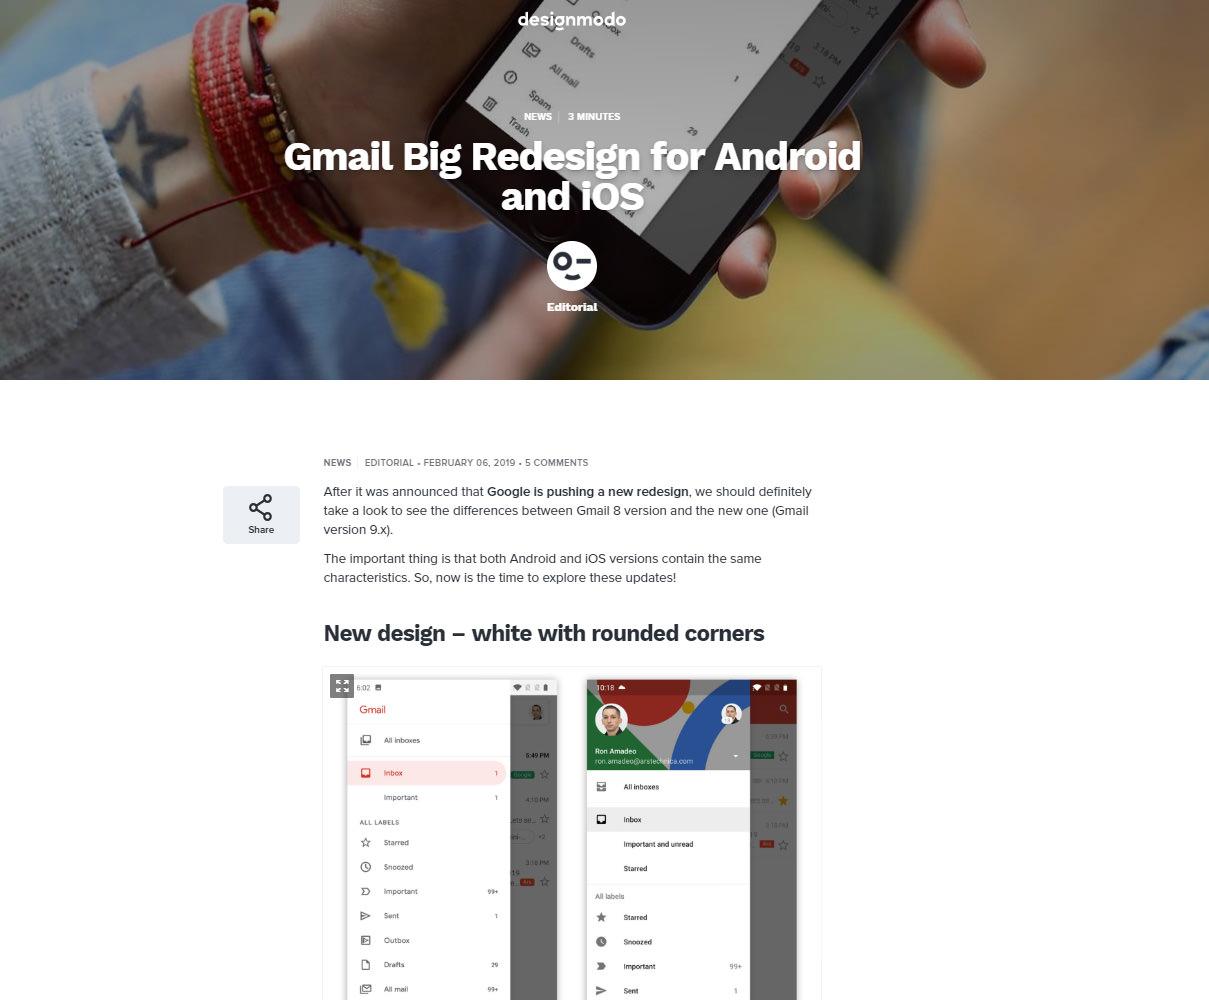 Partial Screen Capture of Designmodo article.